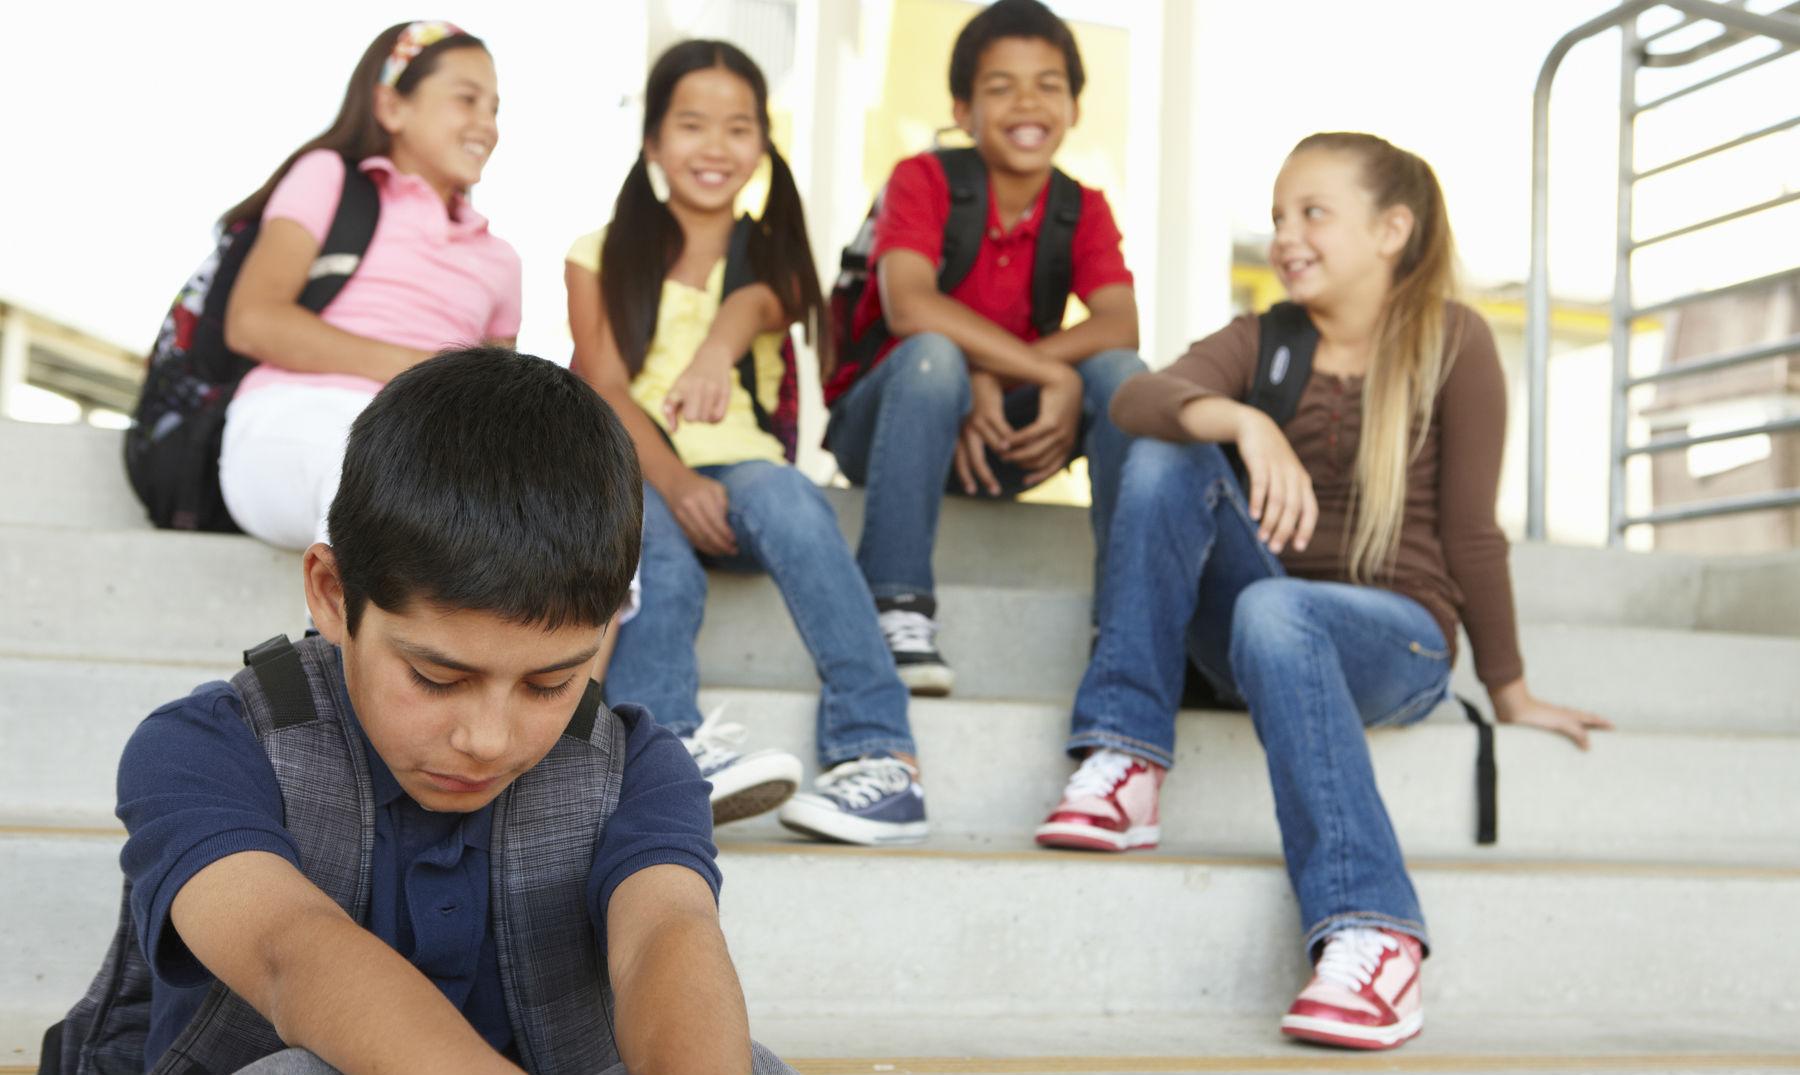 9 formas de ayudar a niños que sufren bullying o acoso escolar